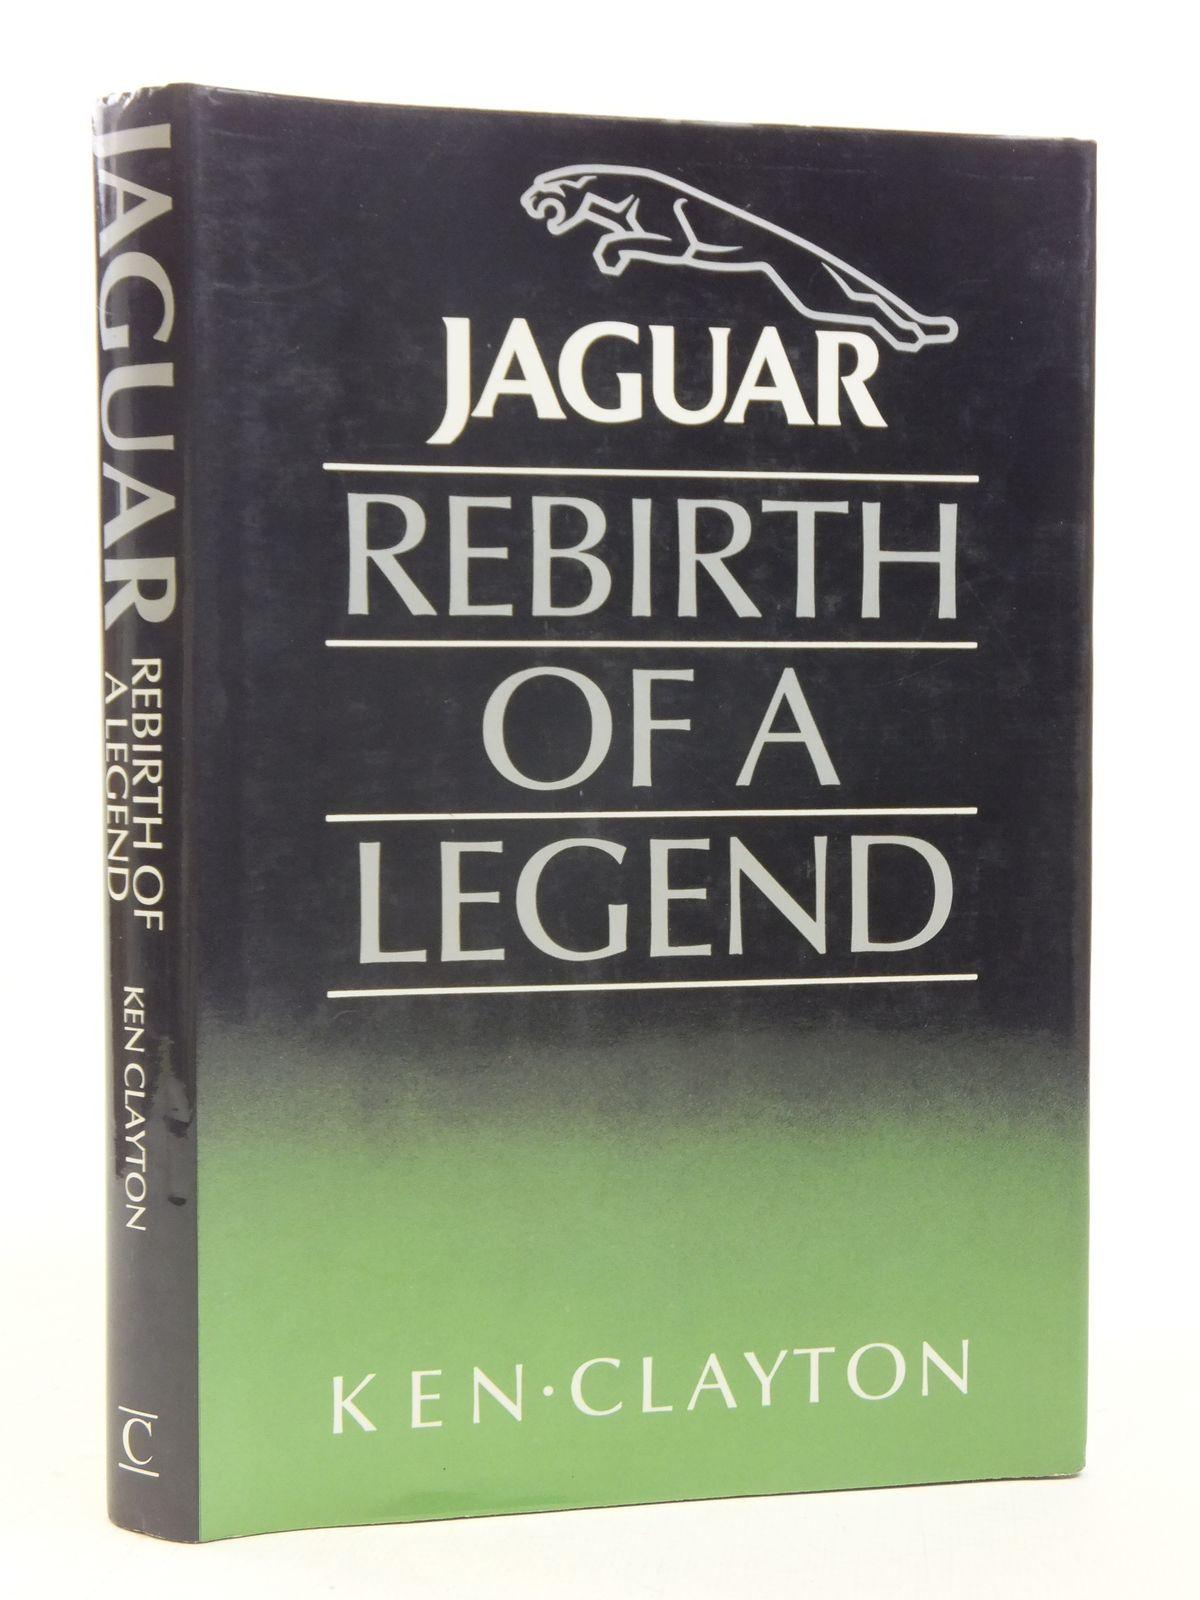 box msc agenzia book jaguar